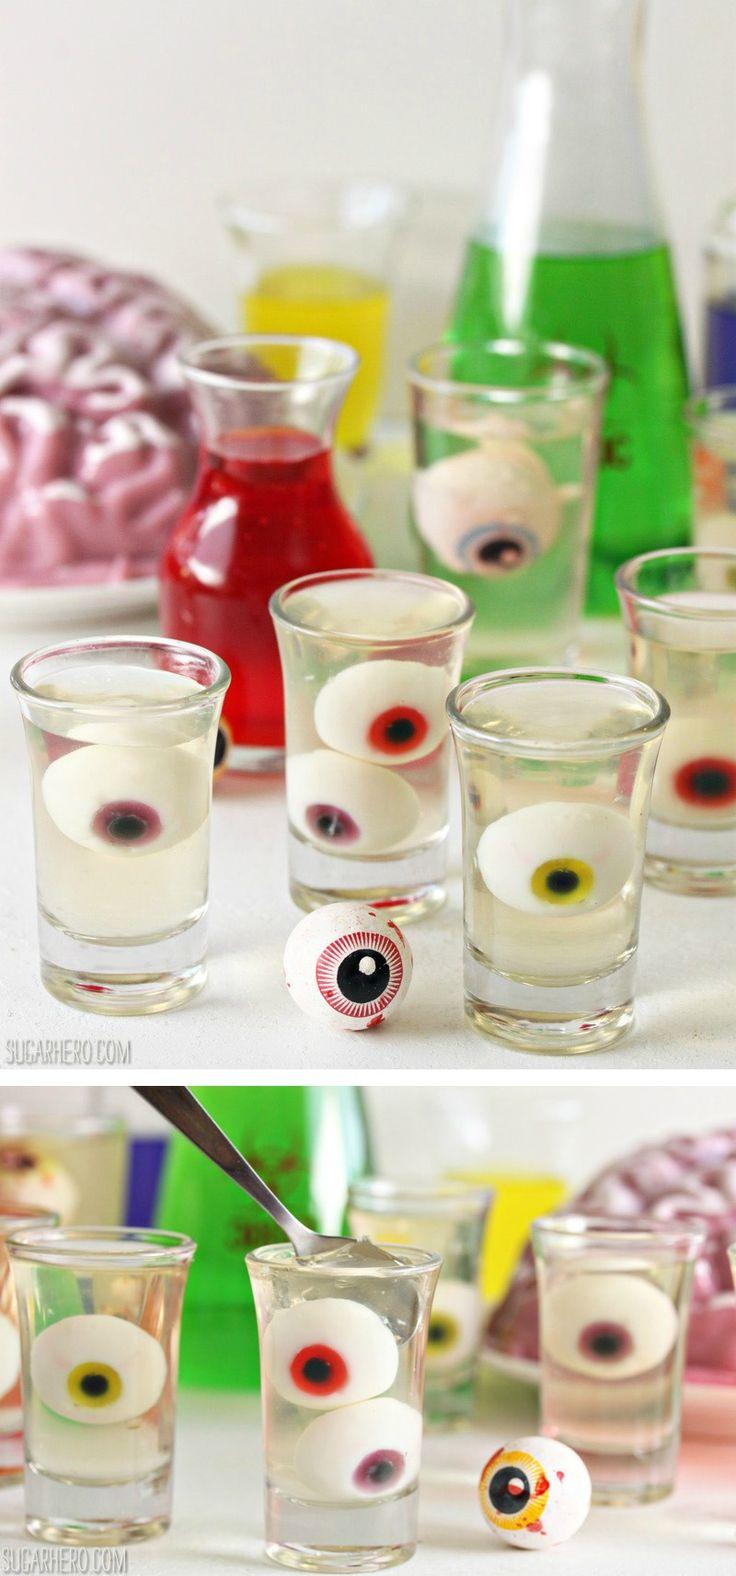 Floating Eyeball Jello Shots - easy and so cute for Halloween!  | From SugarHero.com